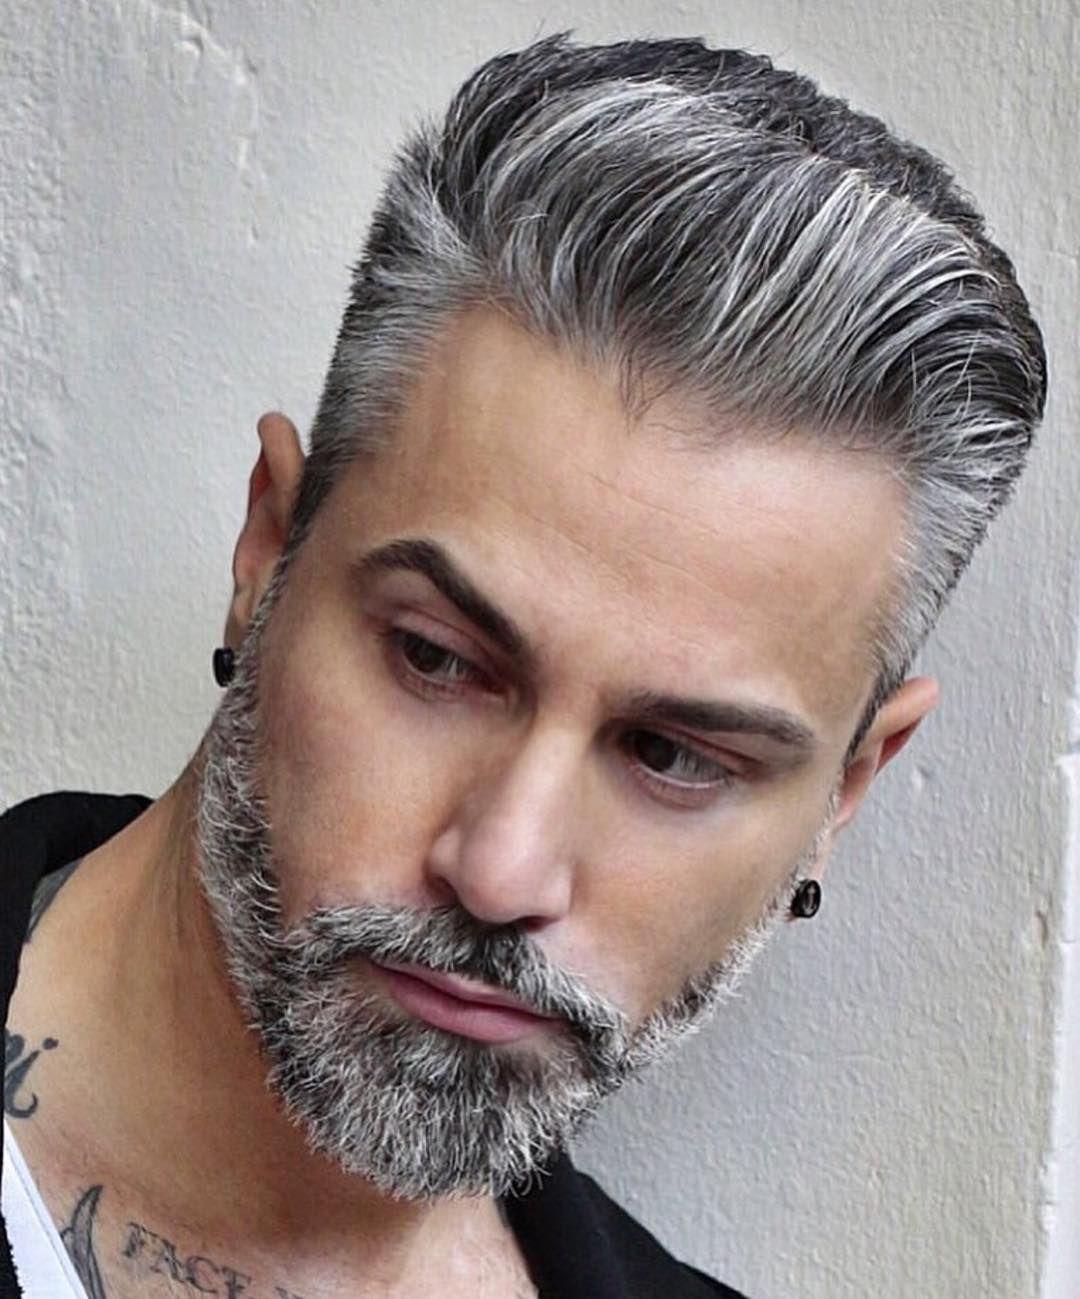 3 408 Me Gusta 11 Comentarios Hairmenstyle Official Hairmenstyle En Instagram Hairmenstyle Silver Hair Men Grey Hair Men Hairstyles For Thin Hair